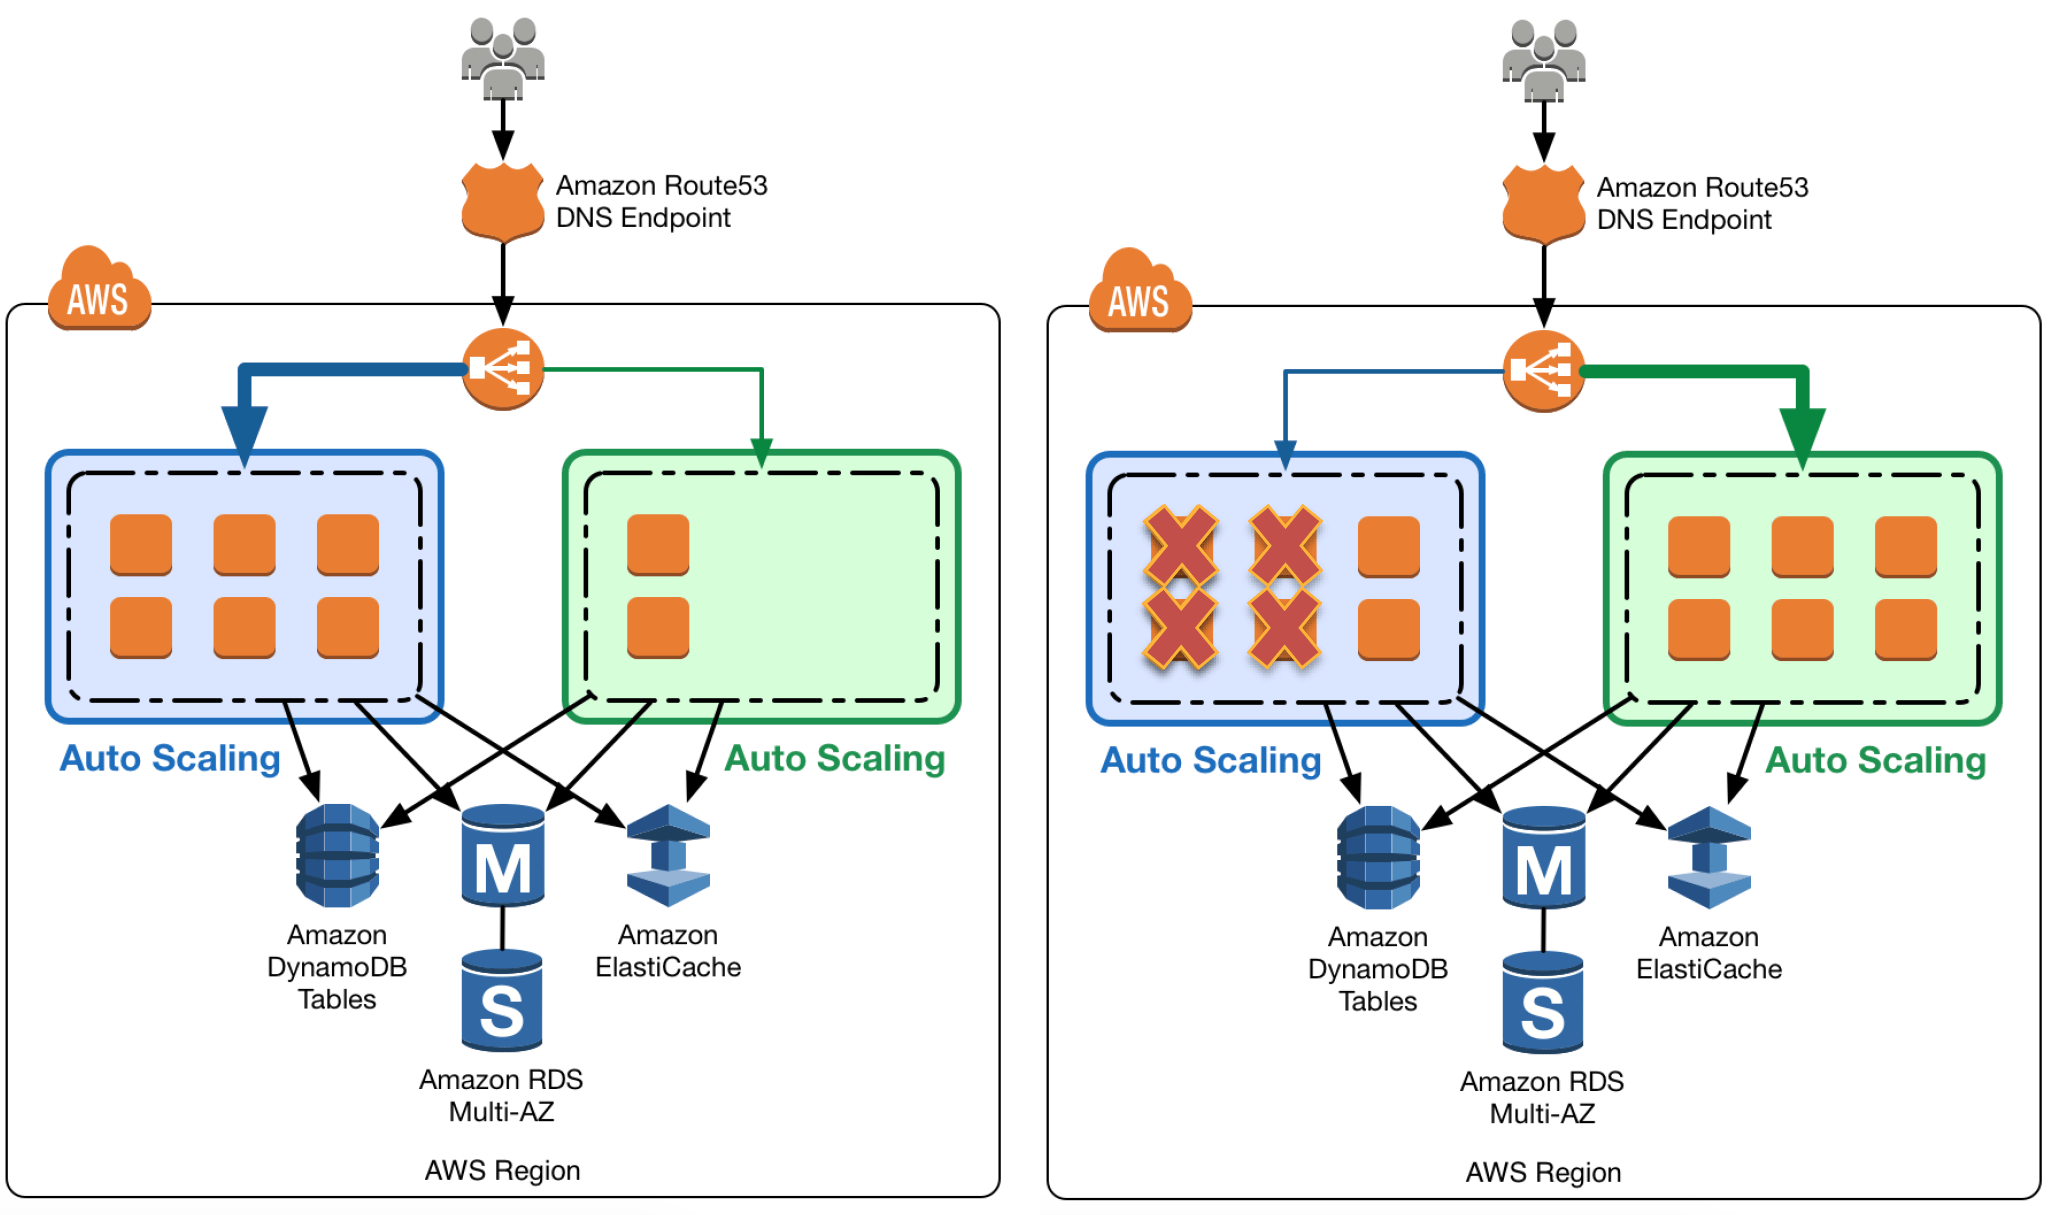 aws route53 zero downtime application architecture